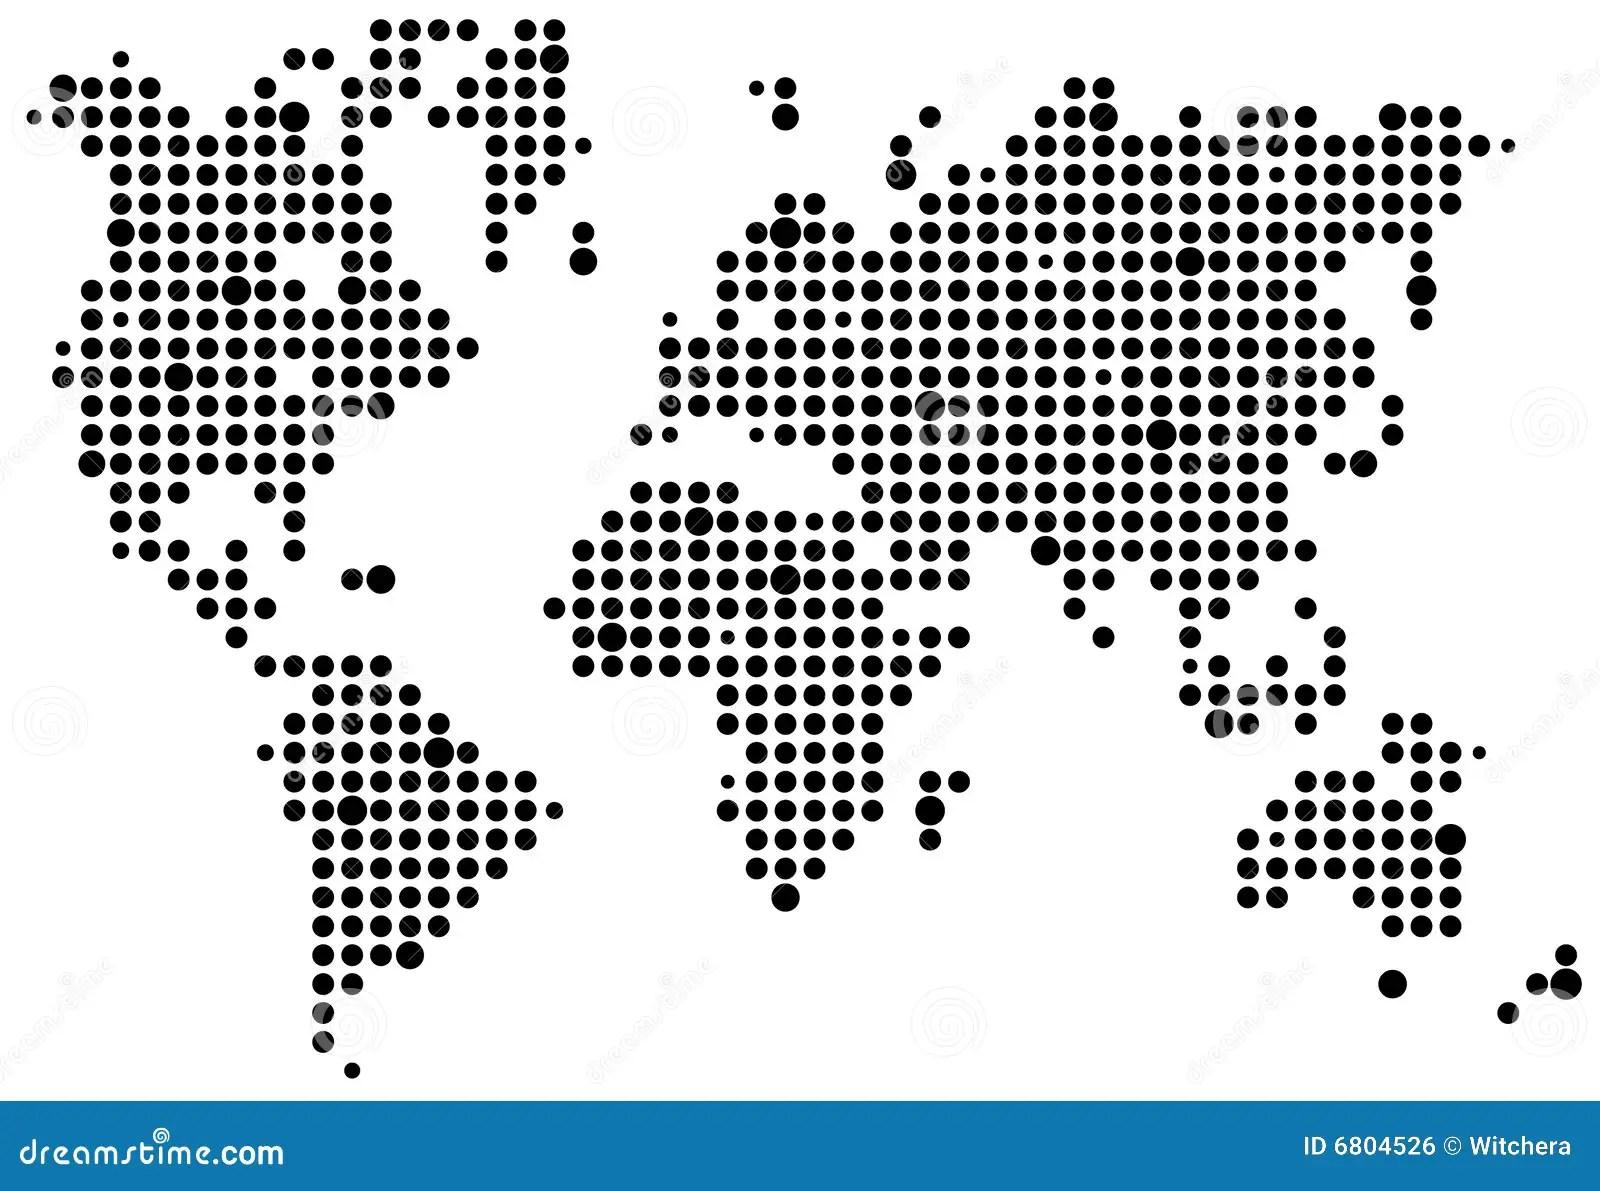 World Pixel Map Royalty Free Stock Image